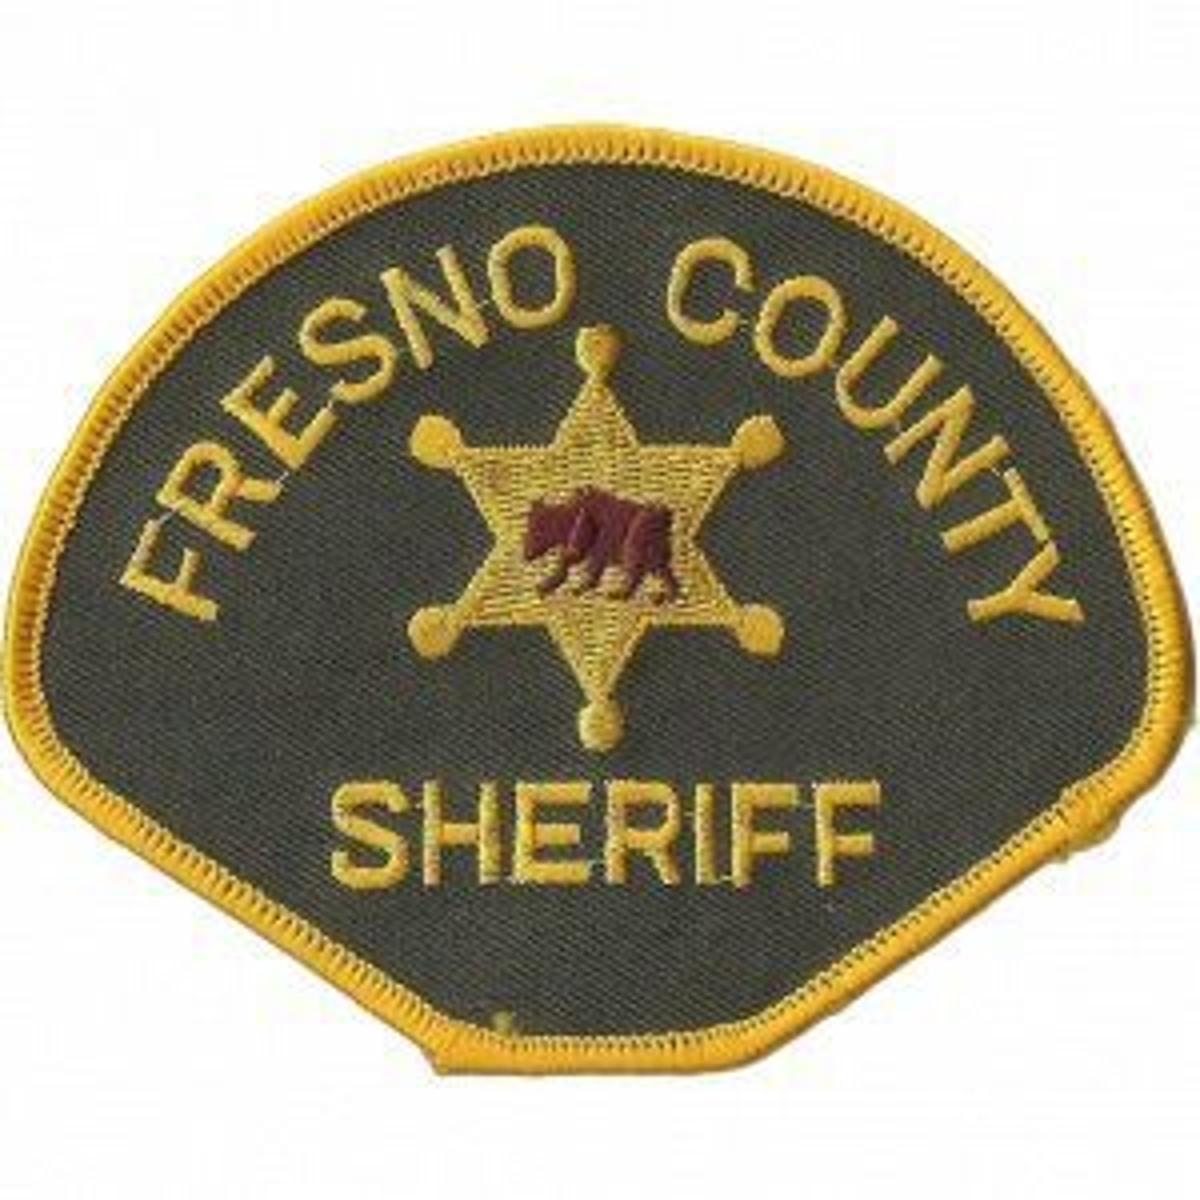 Sheriff's: Reedley man identified in shooting | Community